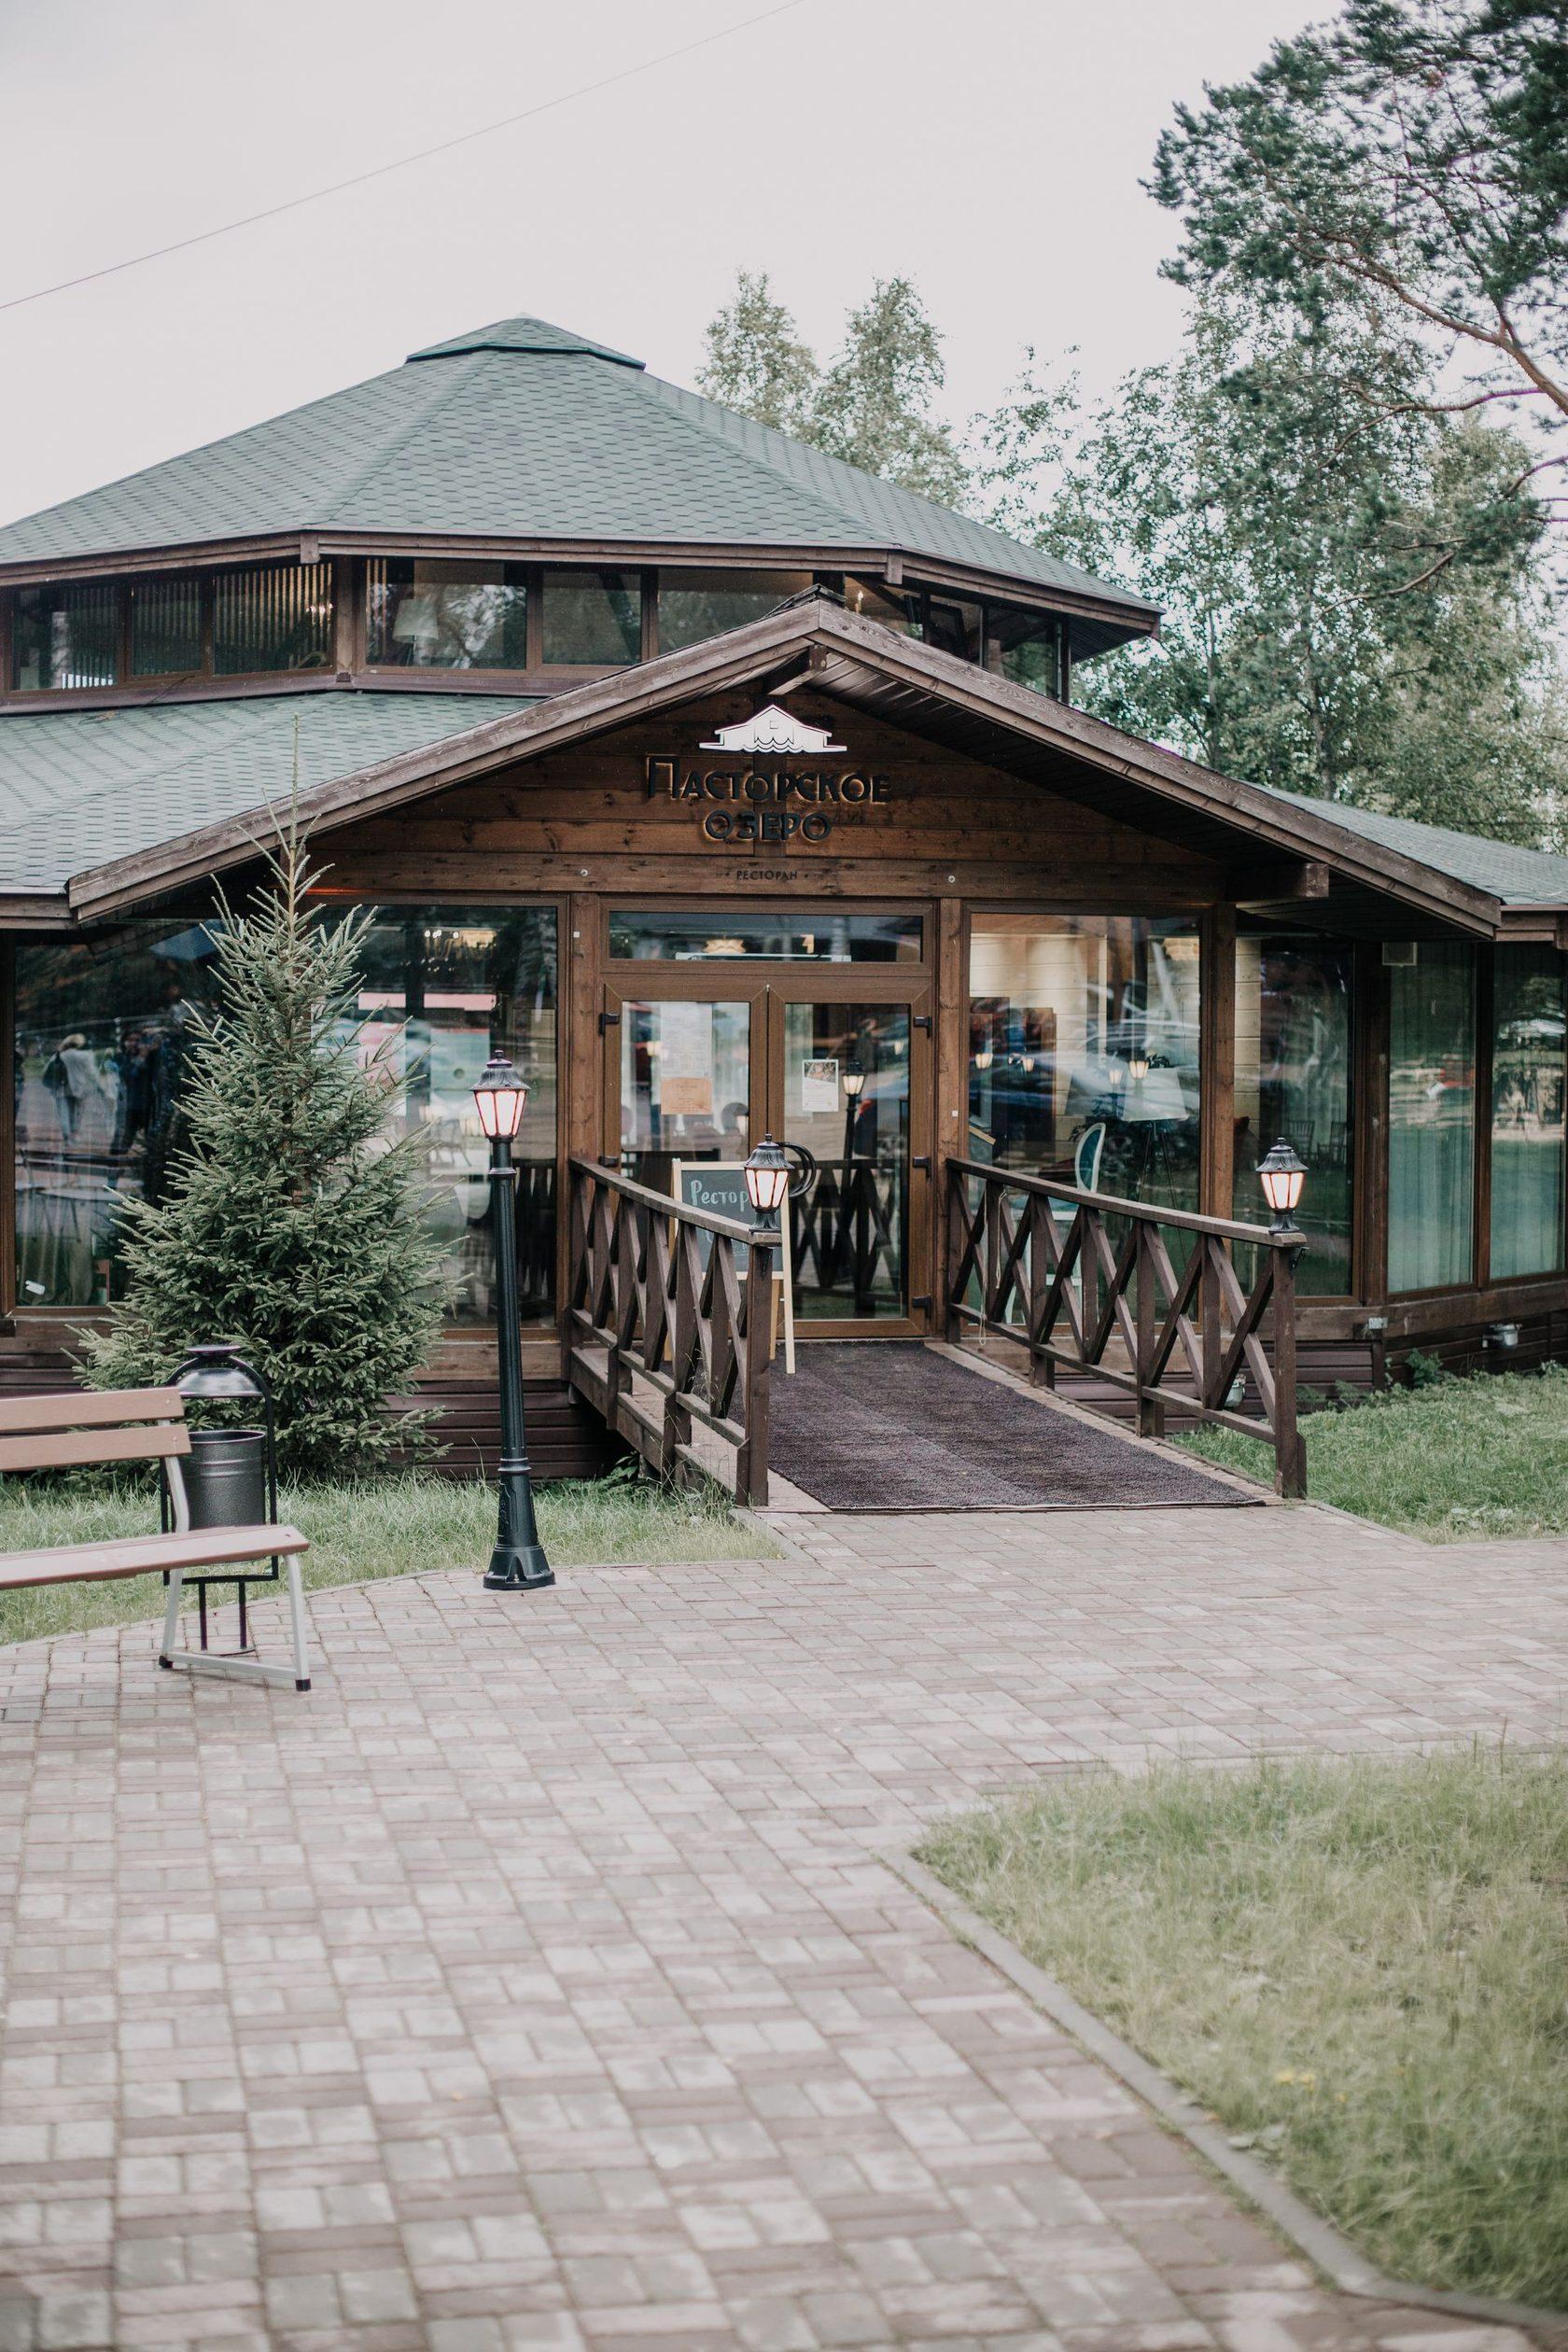 База отдыха «Пасторское озеро»